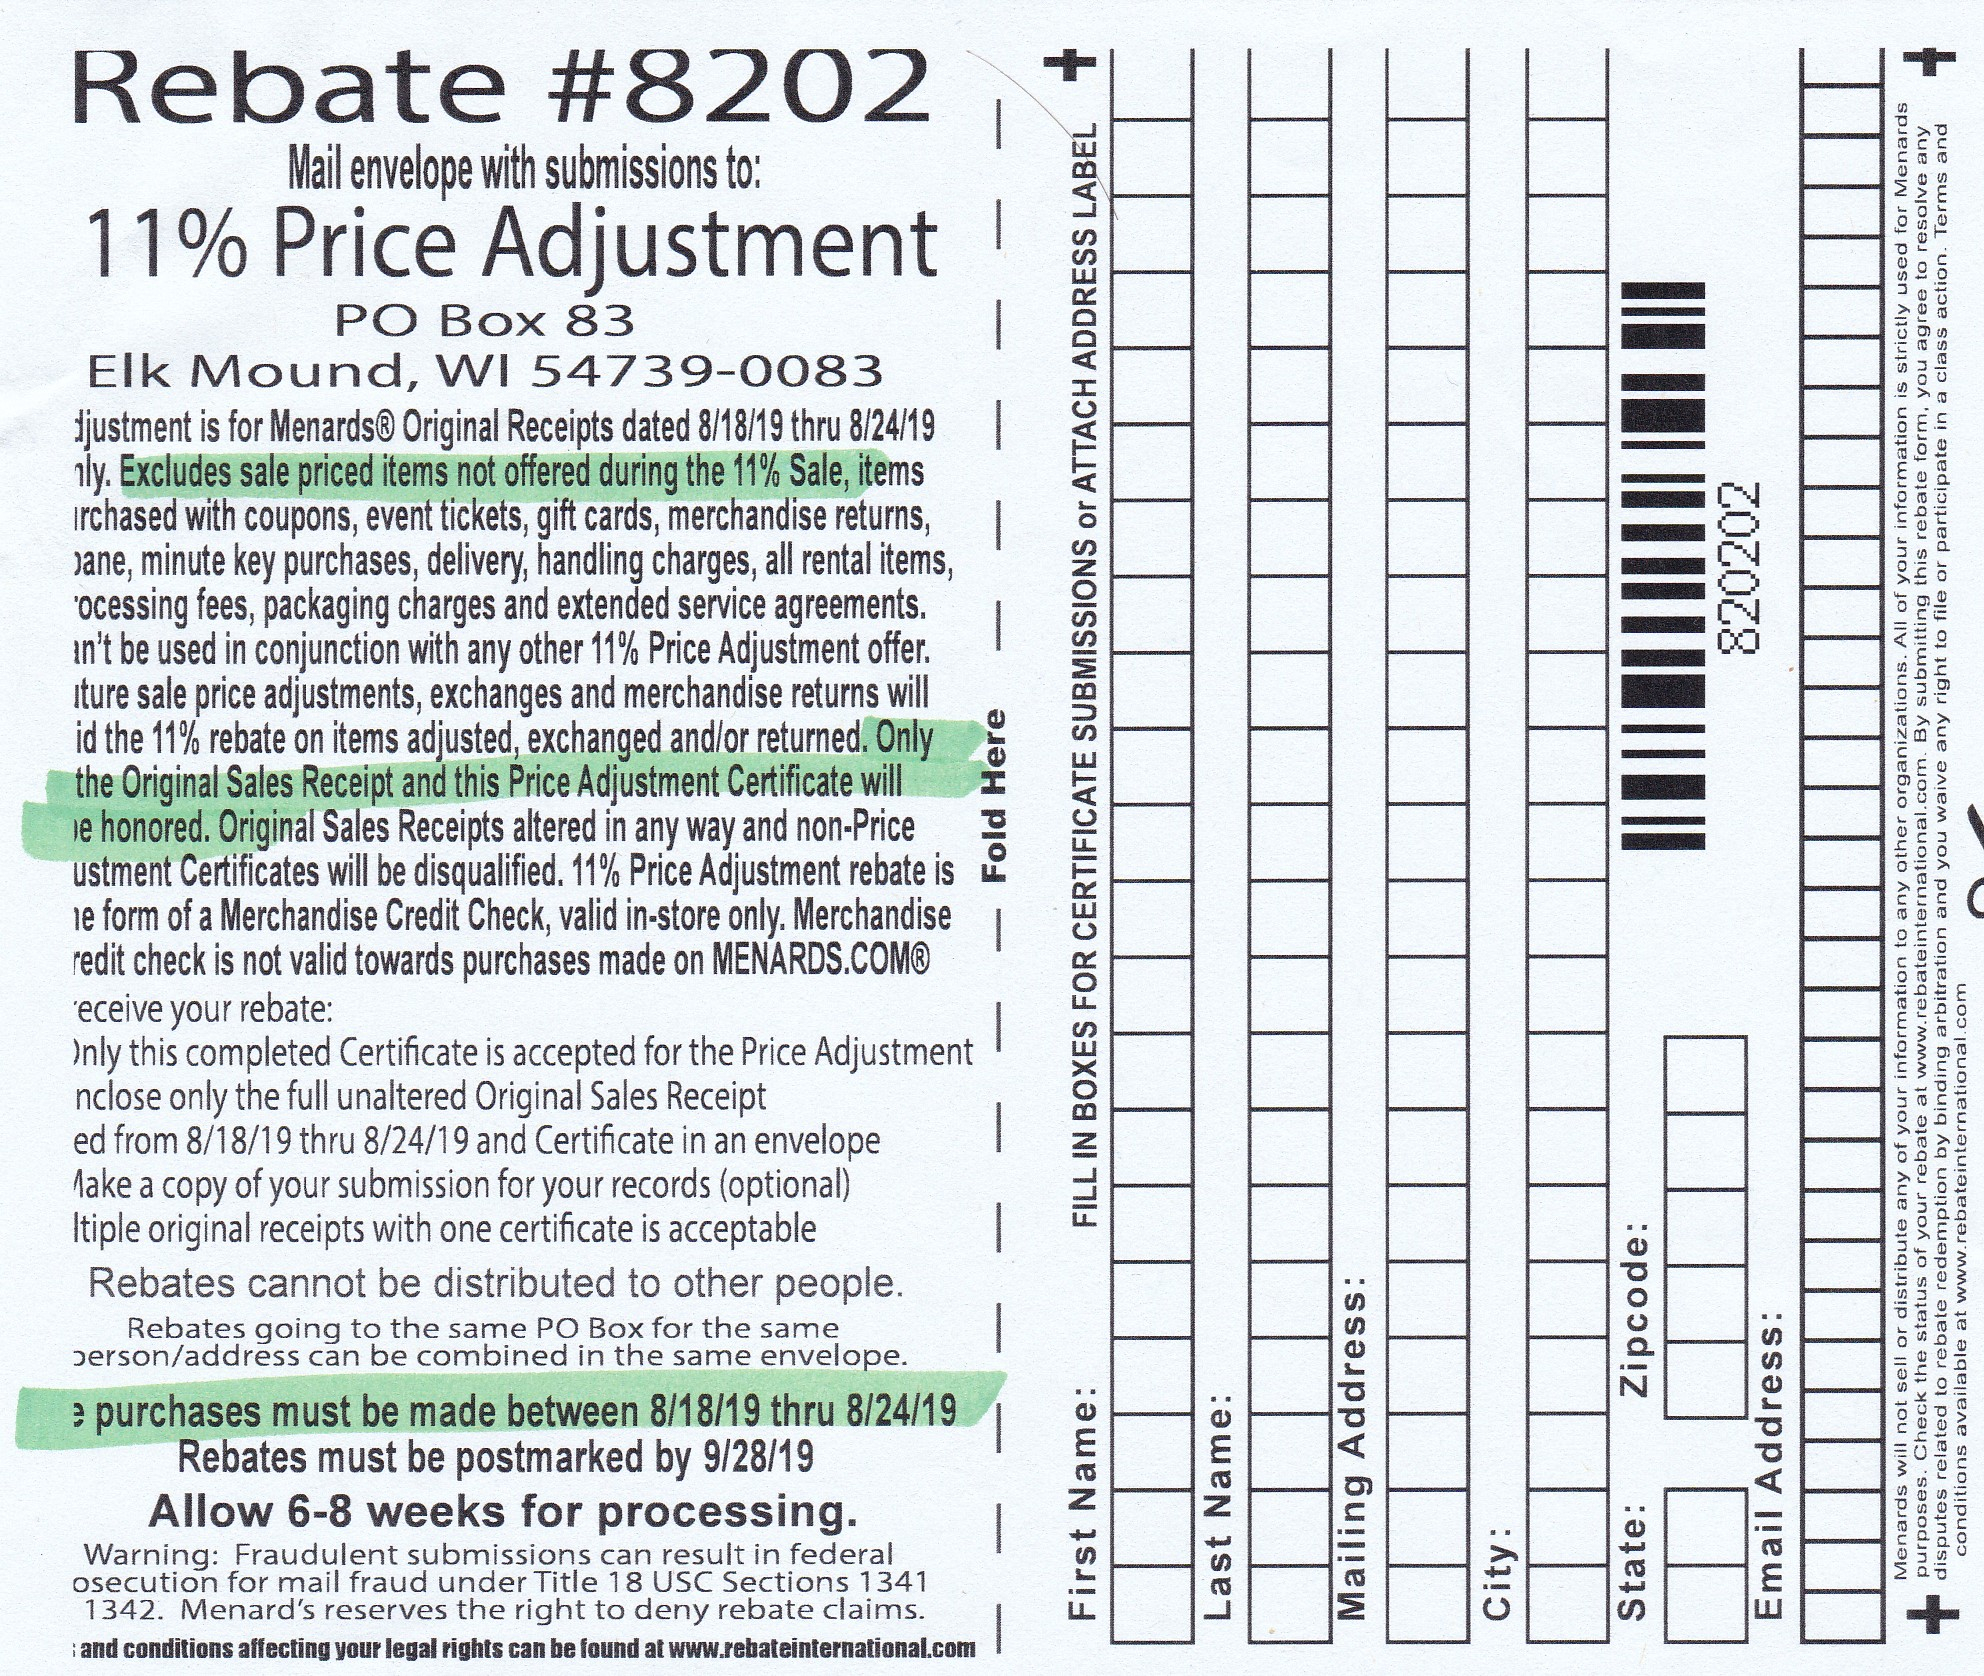 Menards Price Adjustment Rebate Form